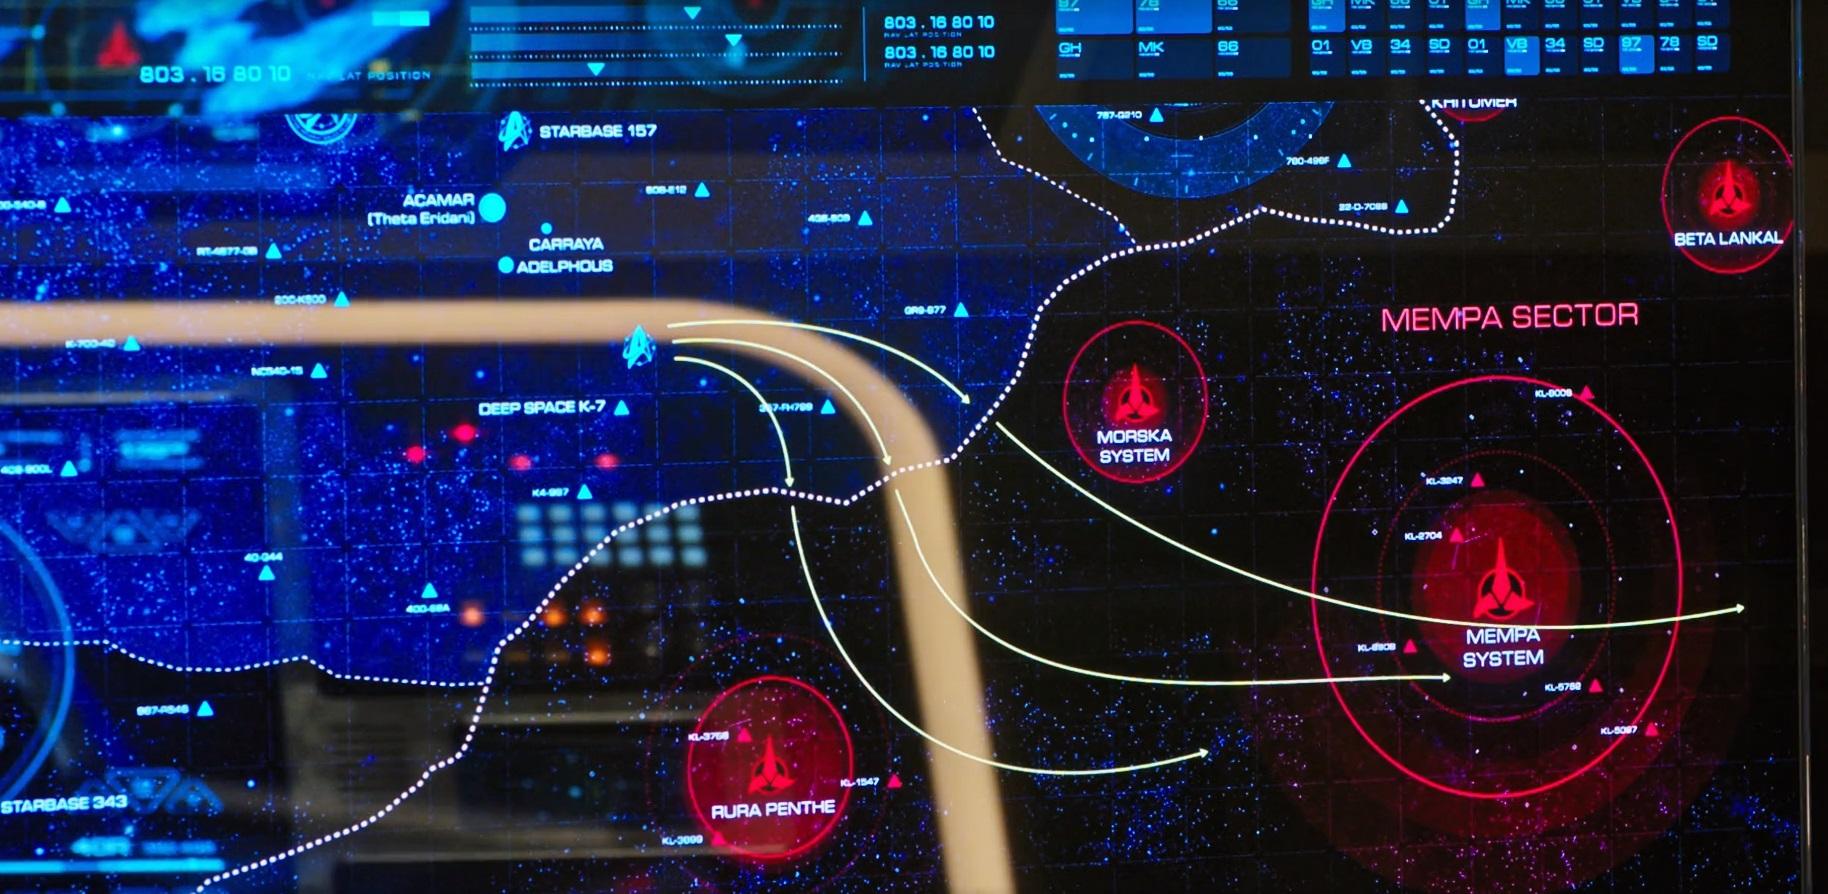 Federation-Klingon border